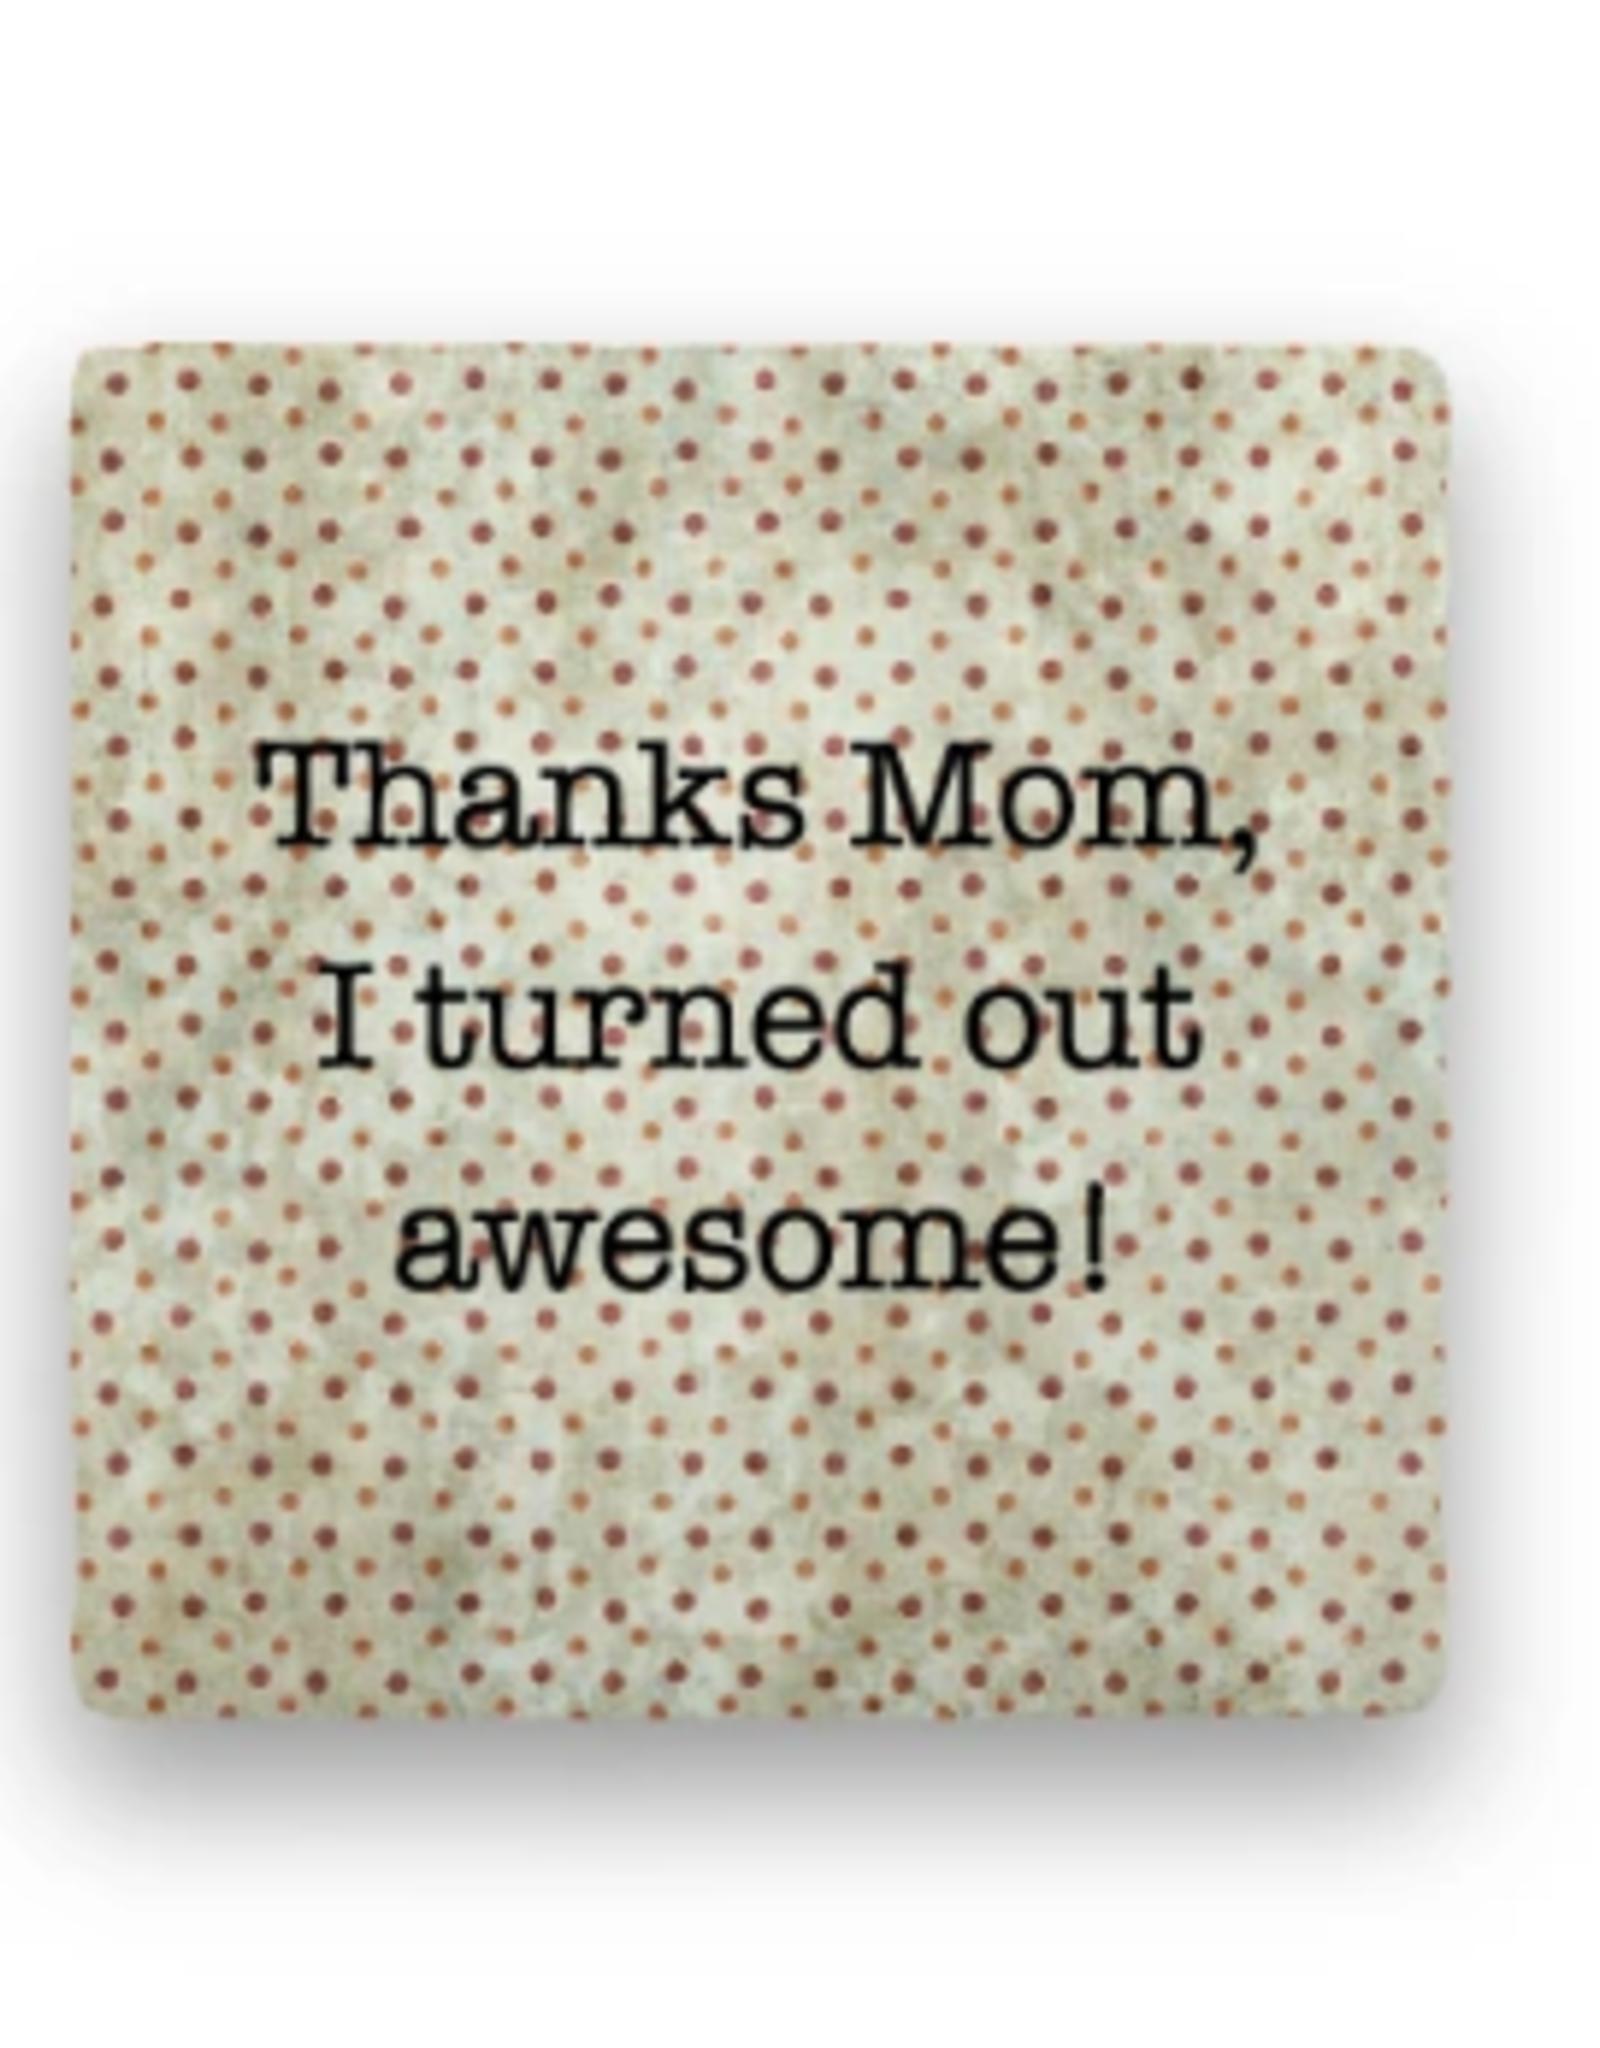 Paisley & Parsley Designs Coaster, Thanks Mom